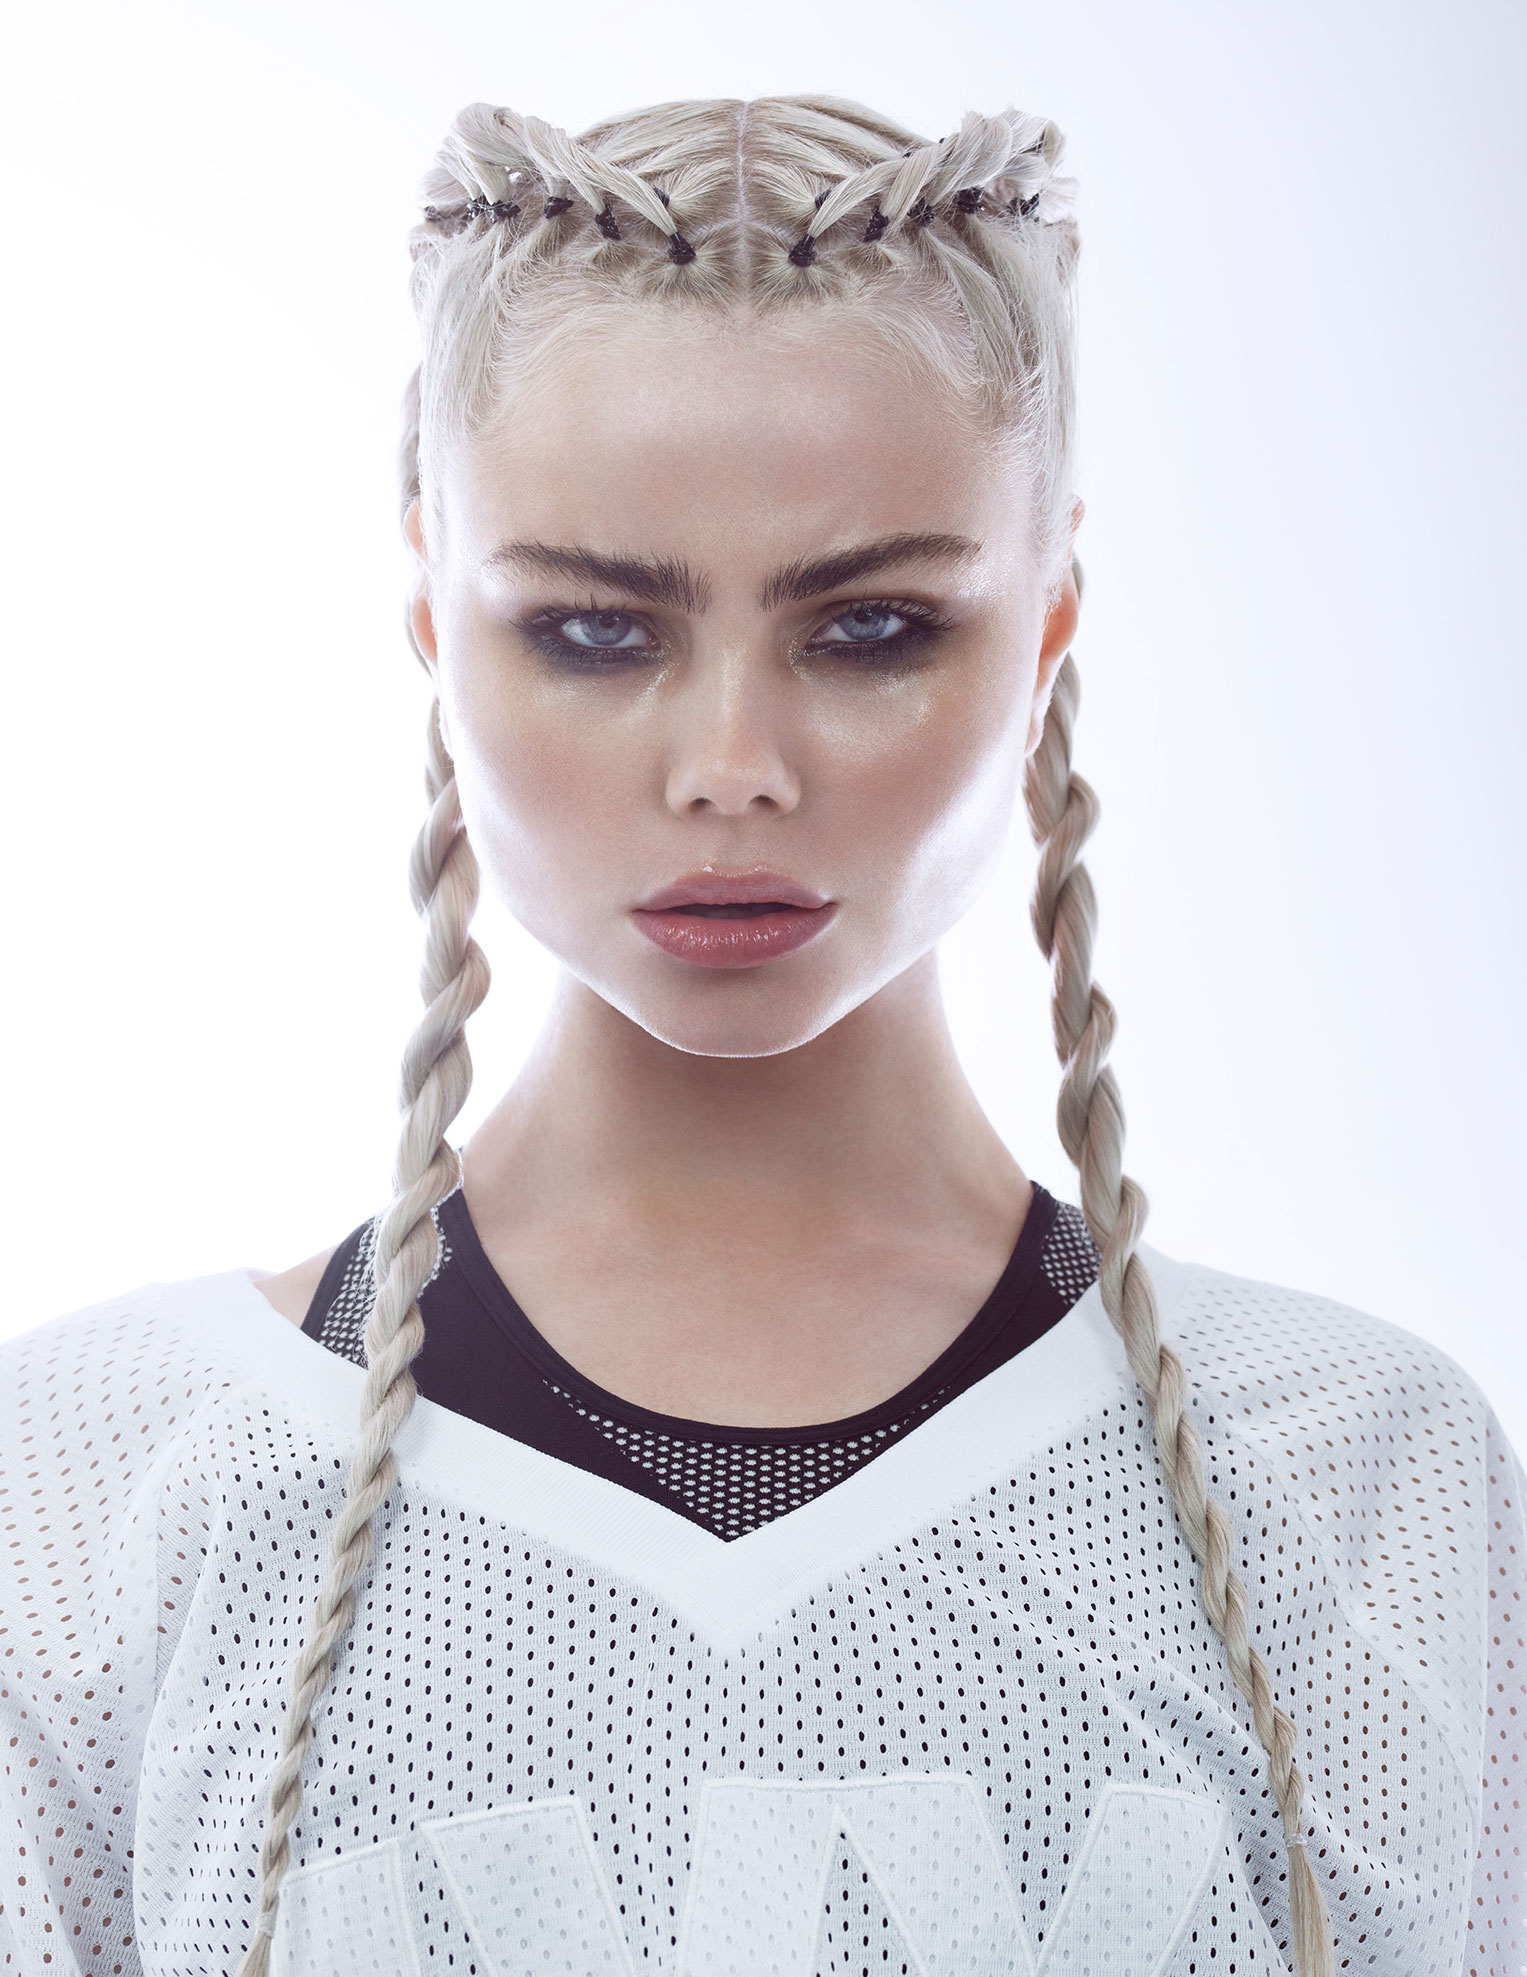 спортивная девушка Brynja Qla Guomundsdottir by Marina Dean-Francis